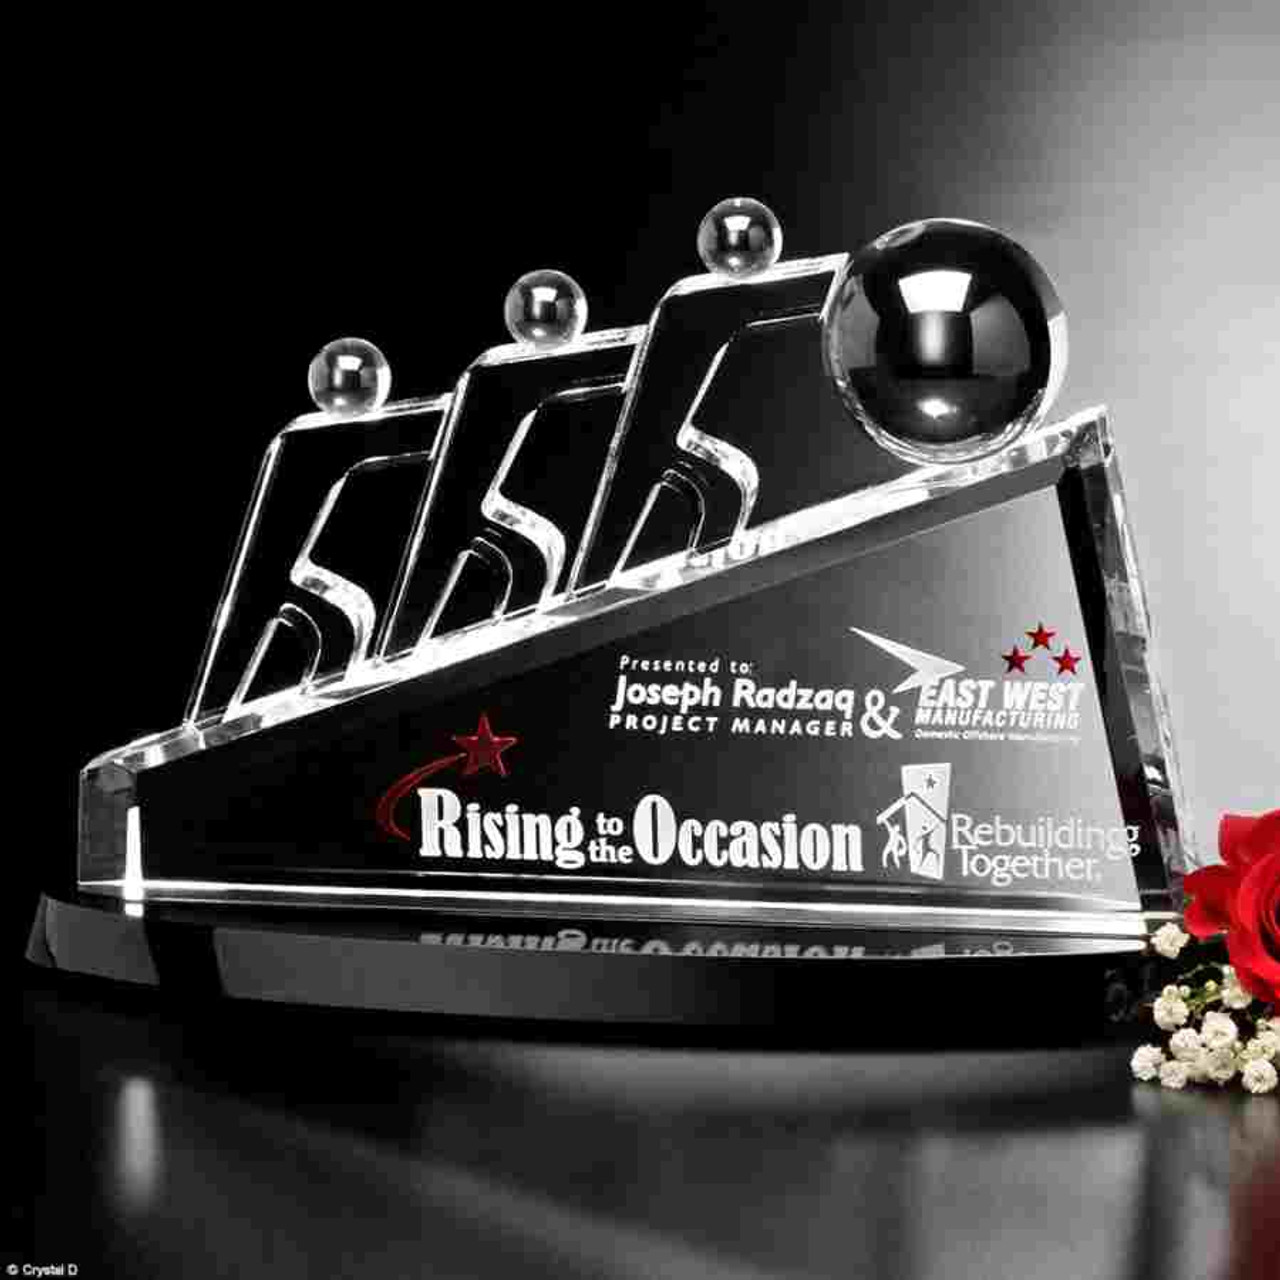 Coalition Award